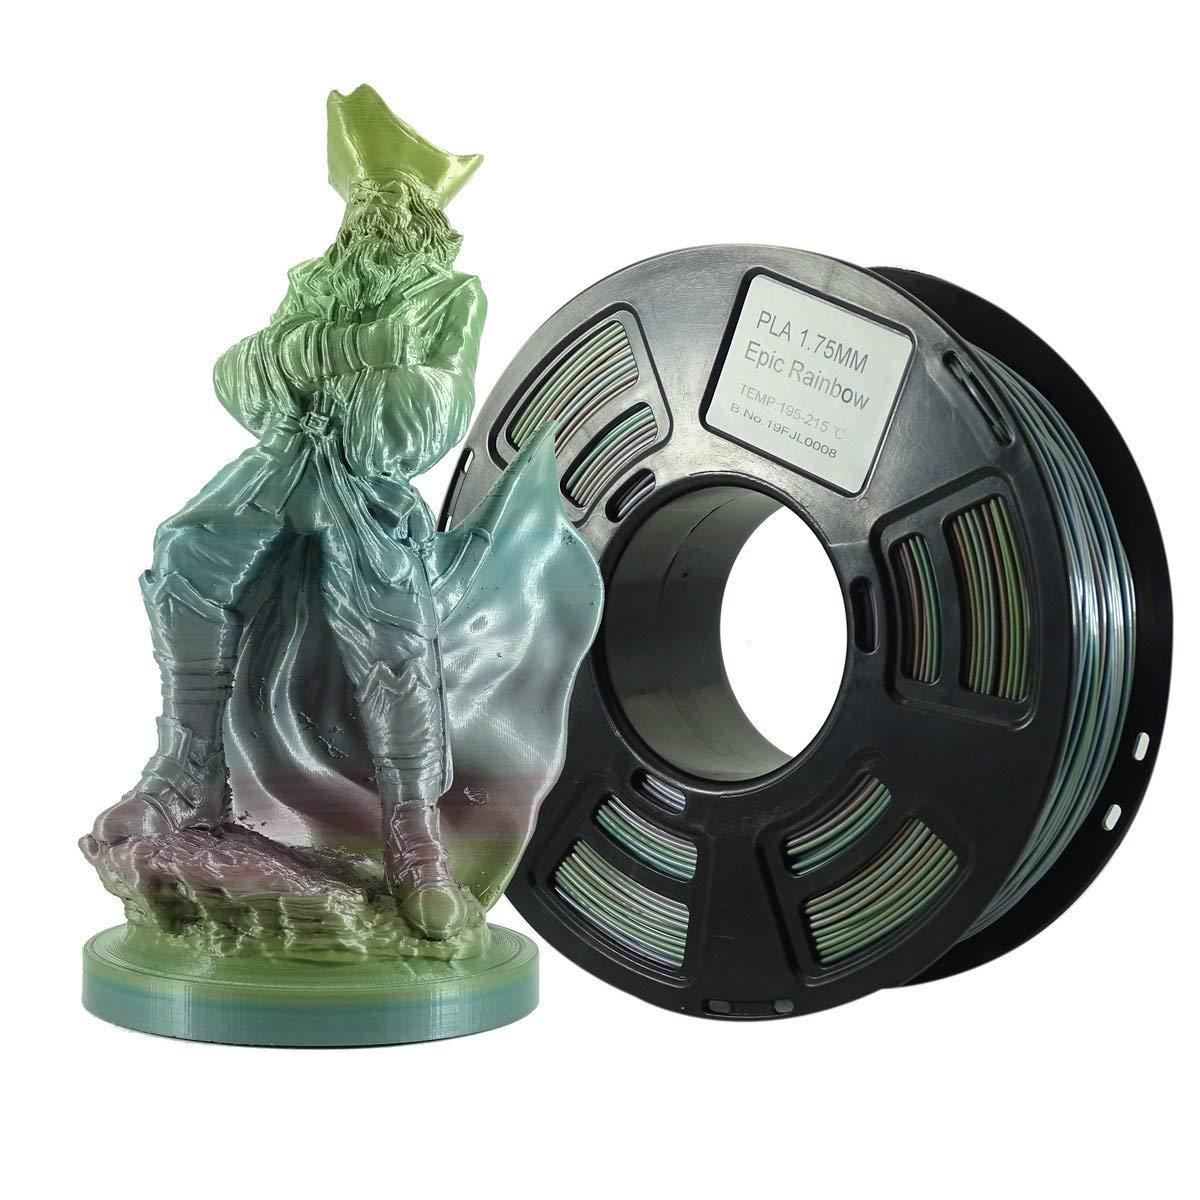 Stronghero3D - Filamento PLA impreso 3D de 1,75 mm, multicolor, 1 ...